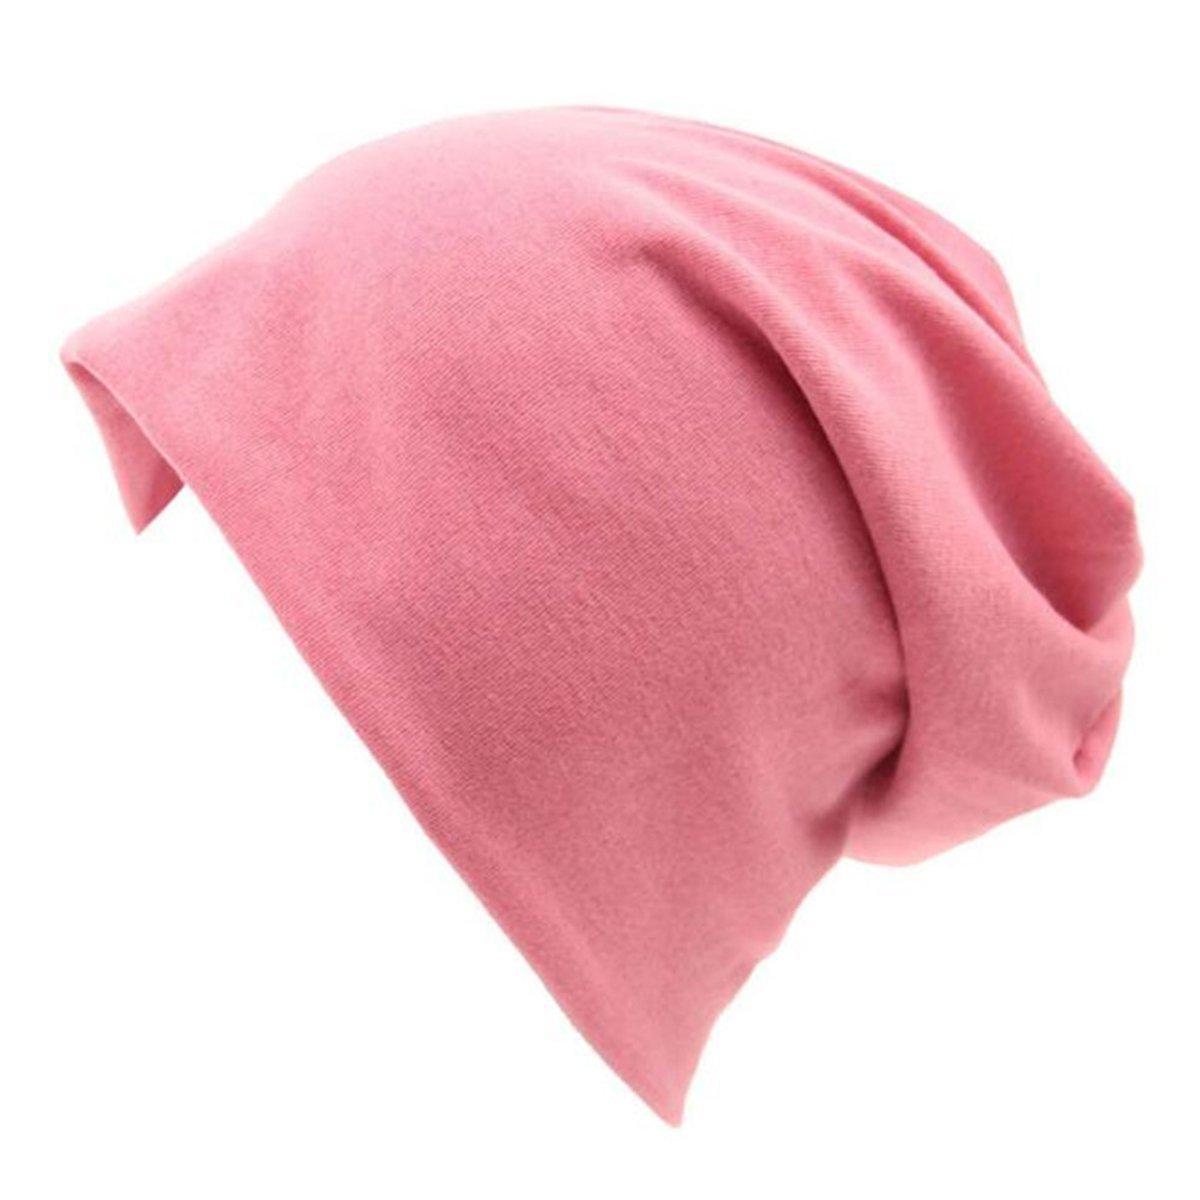 866e9ce1b53 Zando Soft Stretch Beanie Hat Thin Stylish Hip-hop Slouchy Skull Caps Baggy Sleep  Cotton Chemo Cap for Womens Mens MNFUHAS1194AHA1P  1540969766-87743  - ...